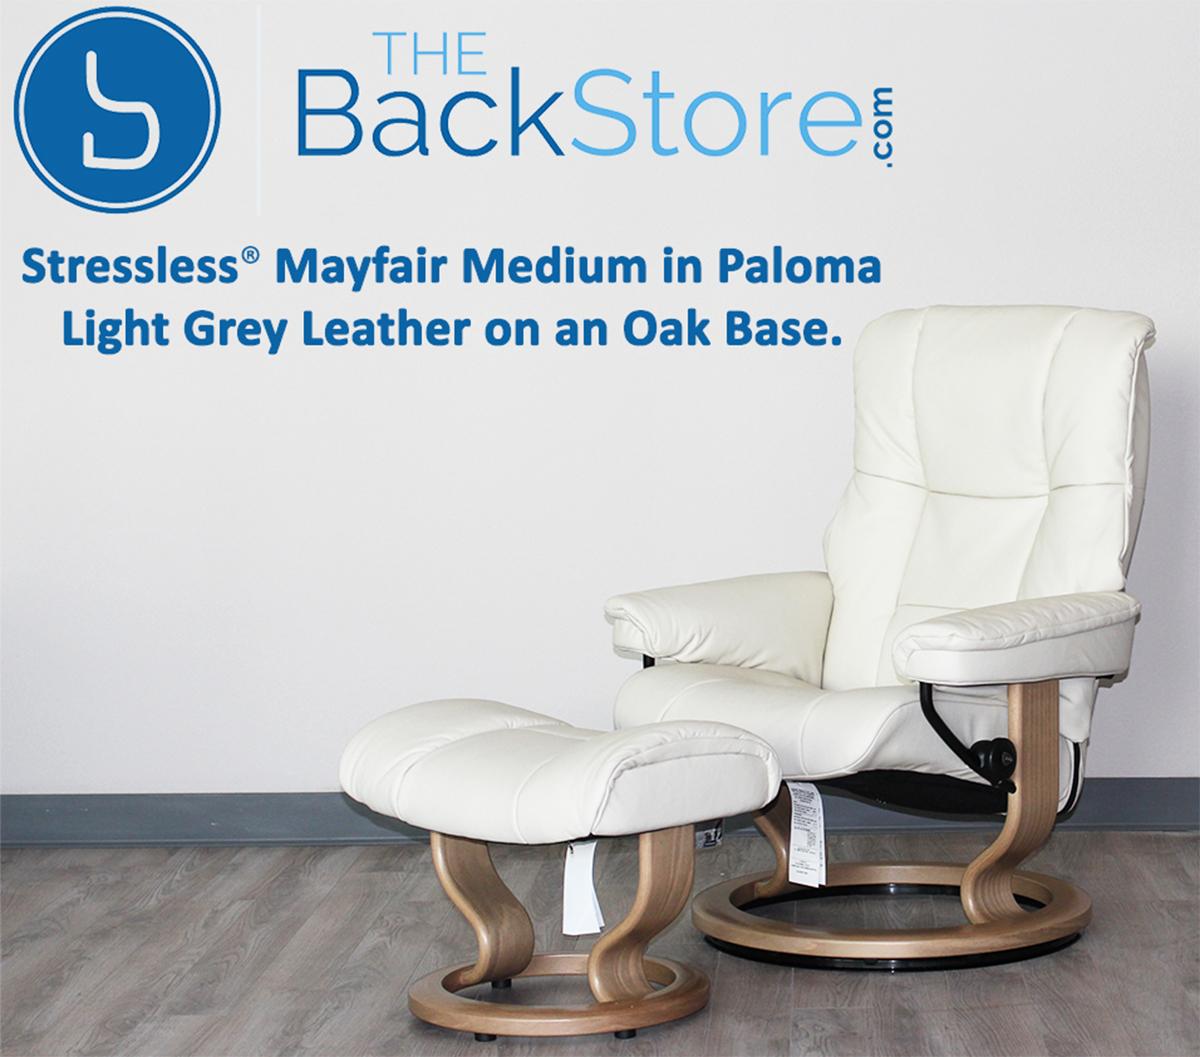 Phenomenal Stressless Mayfair Paloma Light Grey Leather Recliner Chair And Ottoman By Ekornes Inzonedesignstudio Interior Chair Design Inzonedesignstudiocom